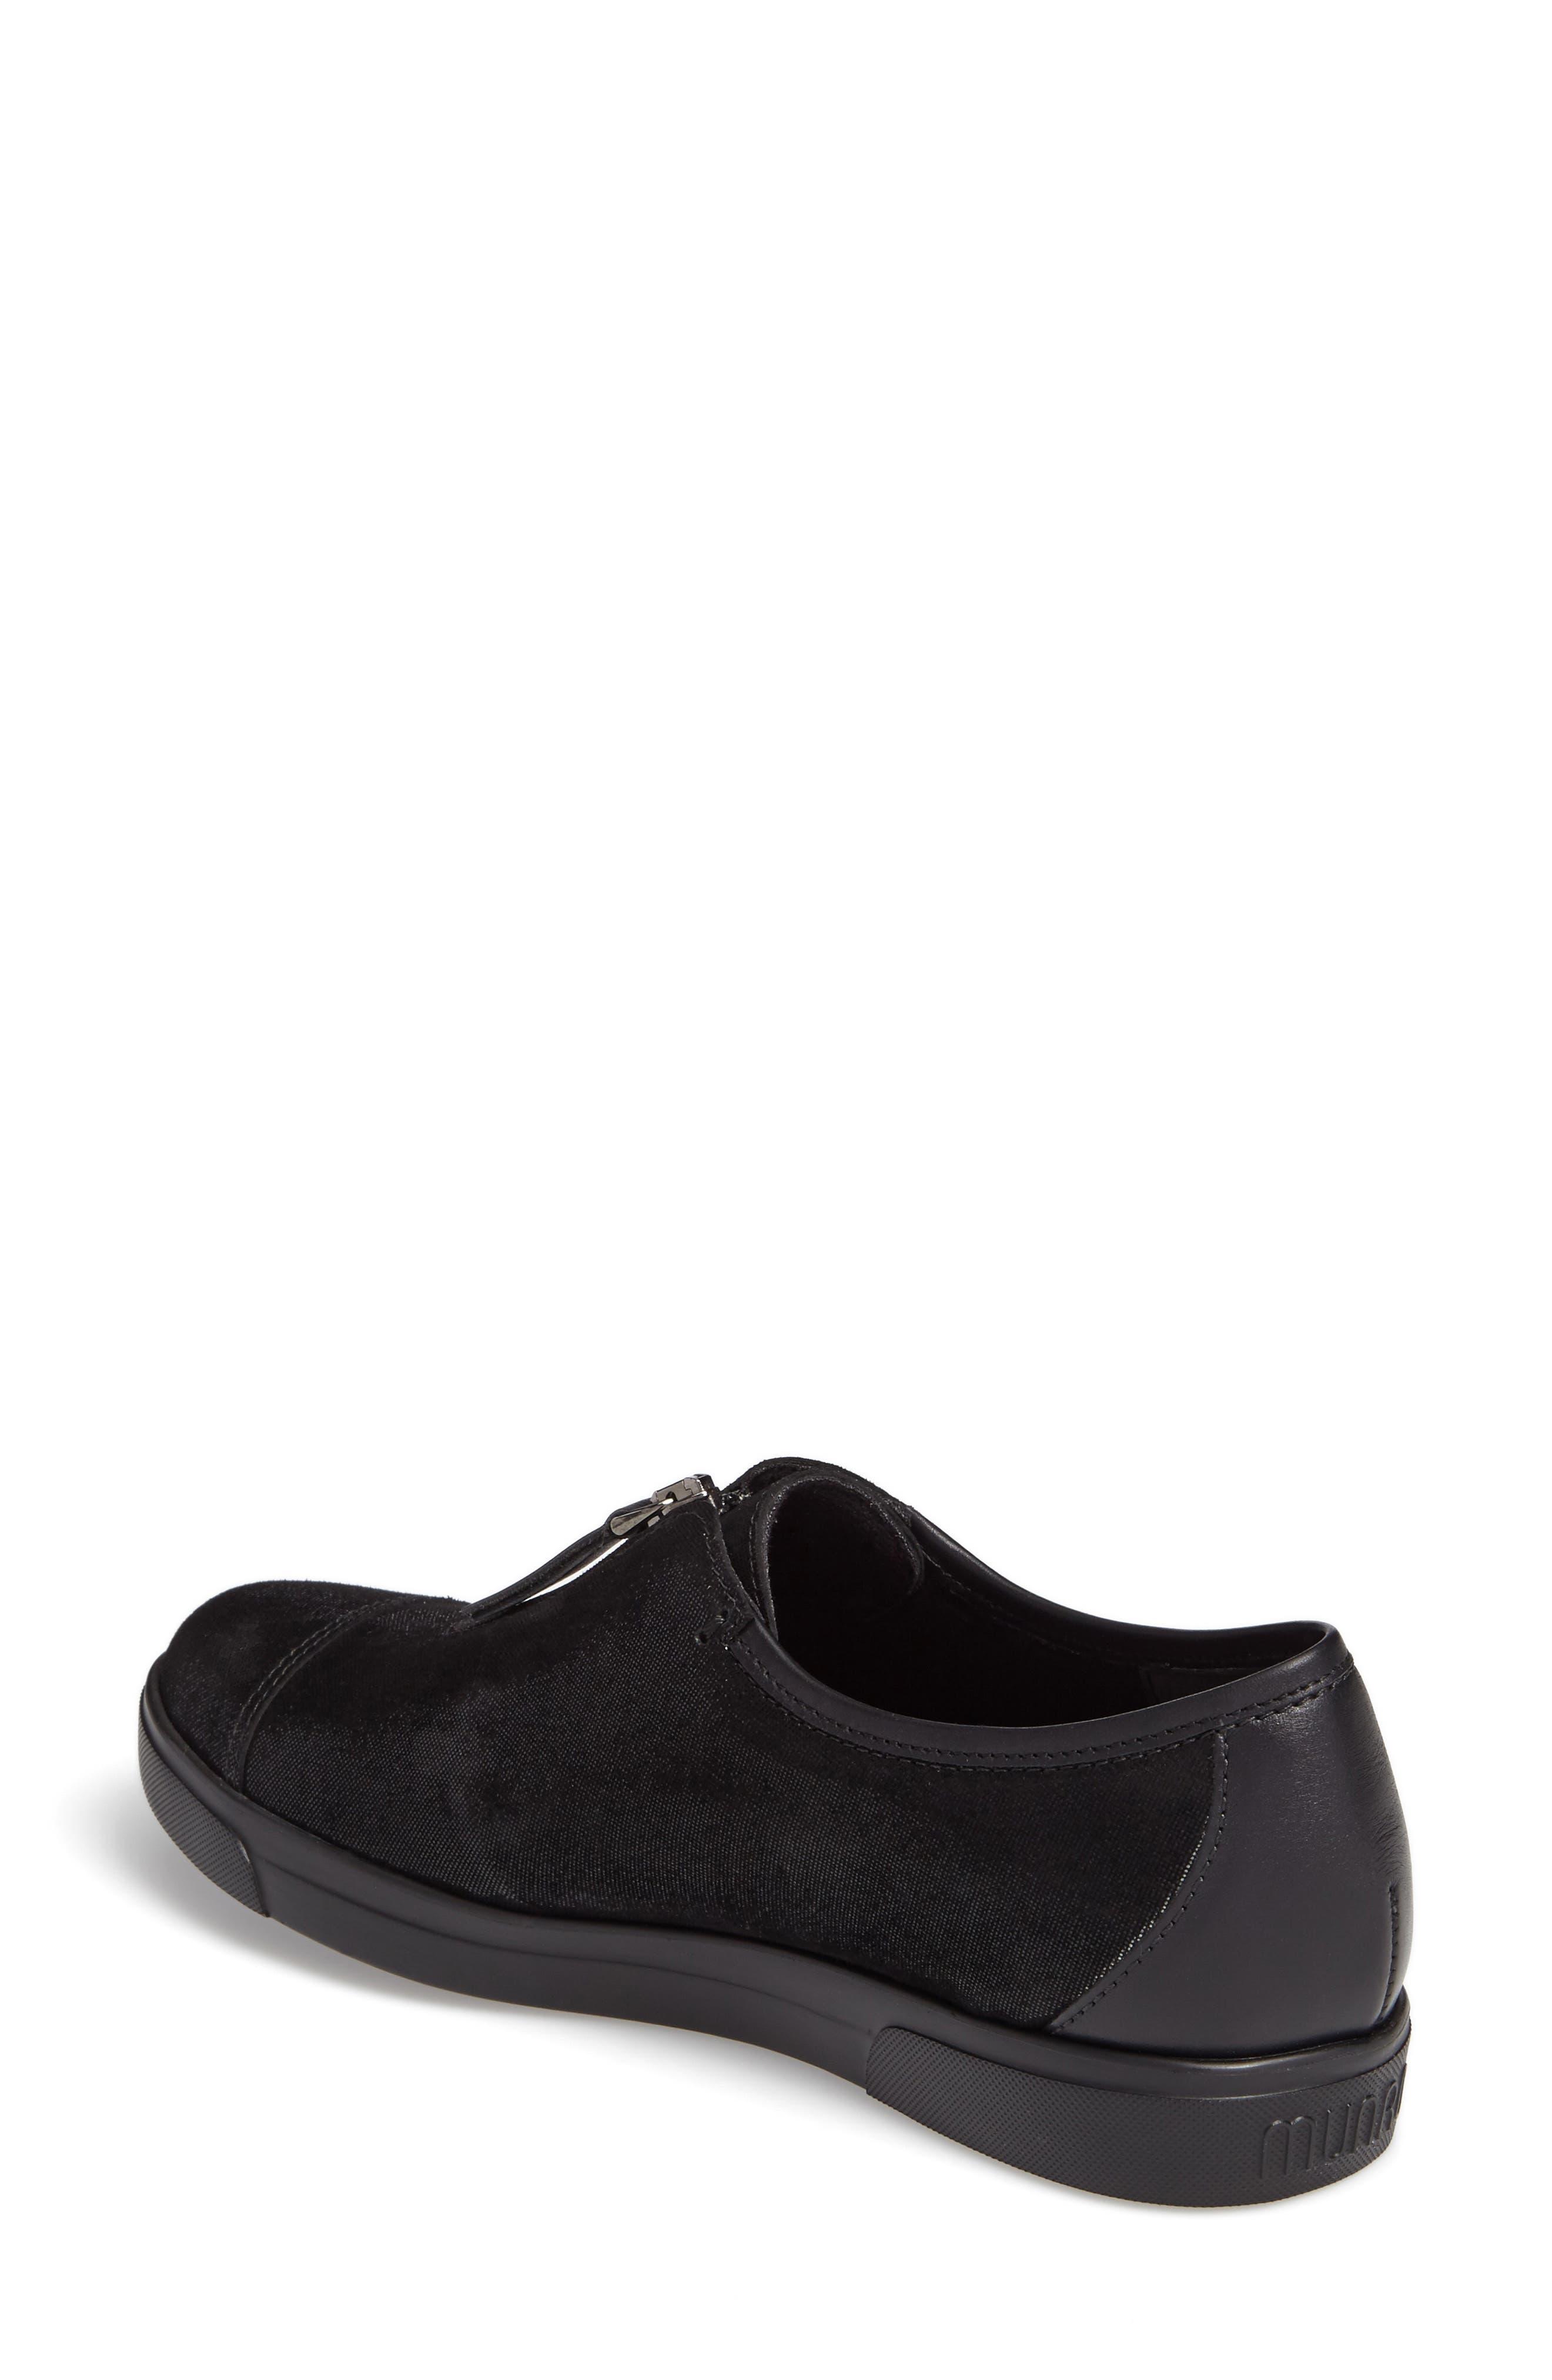 Alternate Image 2  - Munro Roslyn Zip Sneaker (Women)